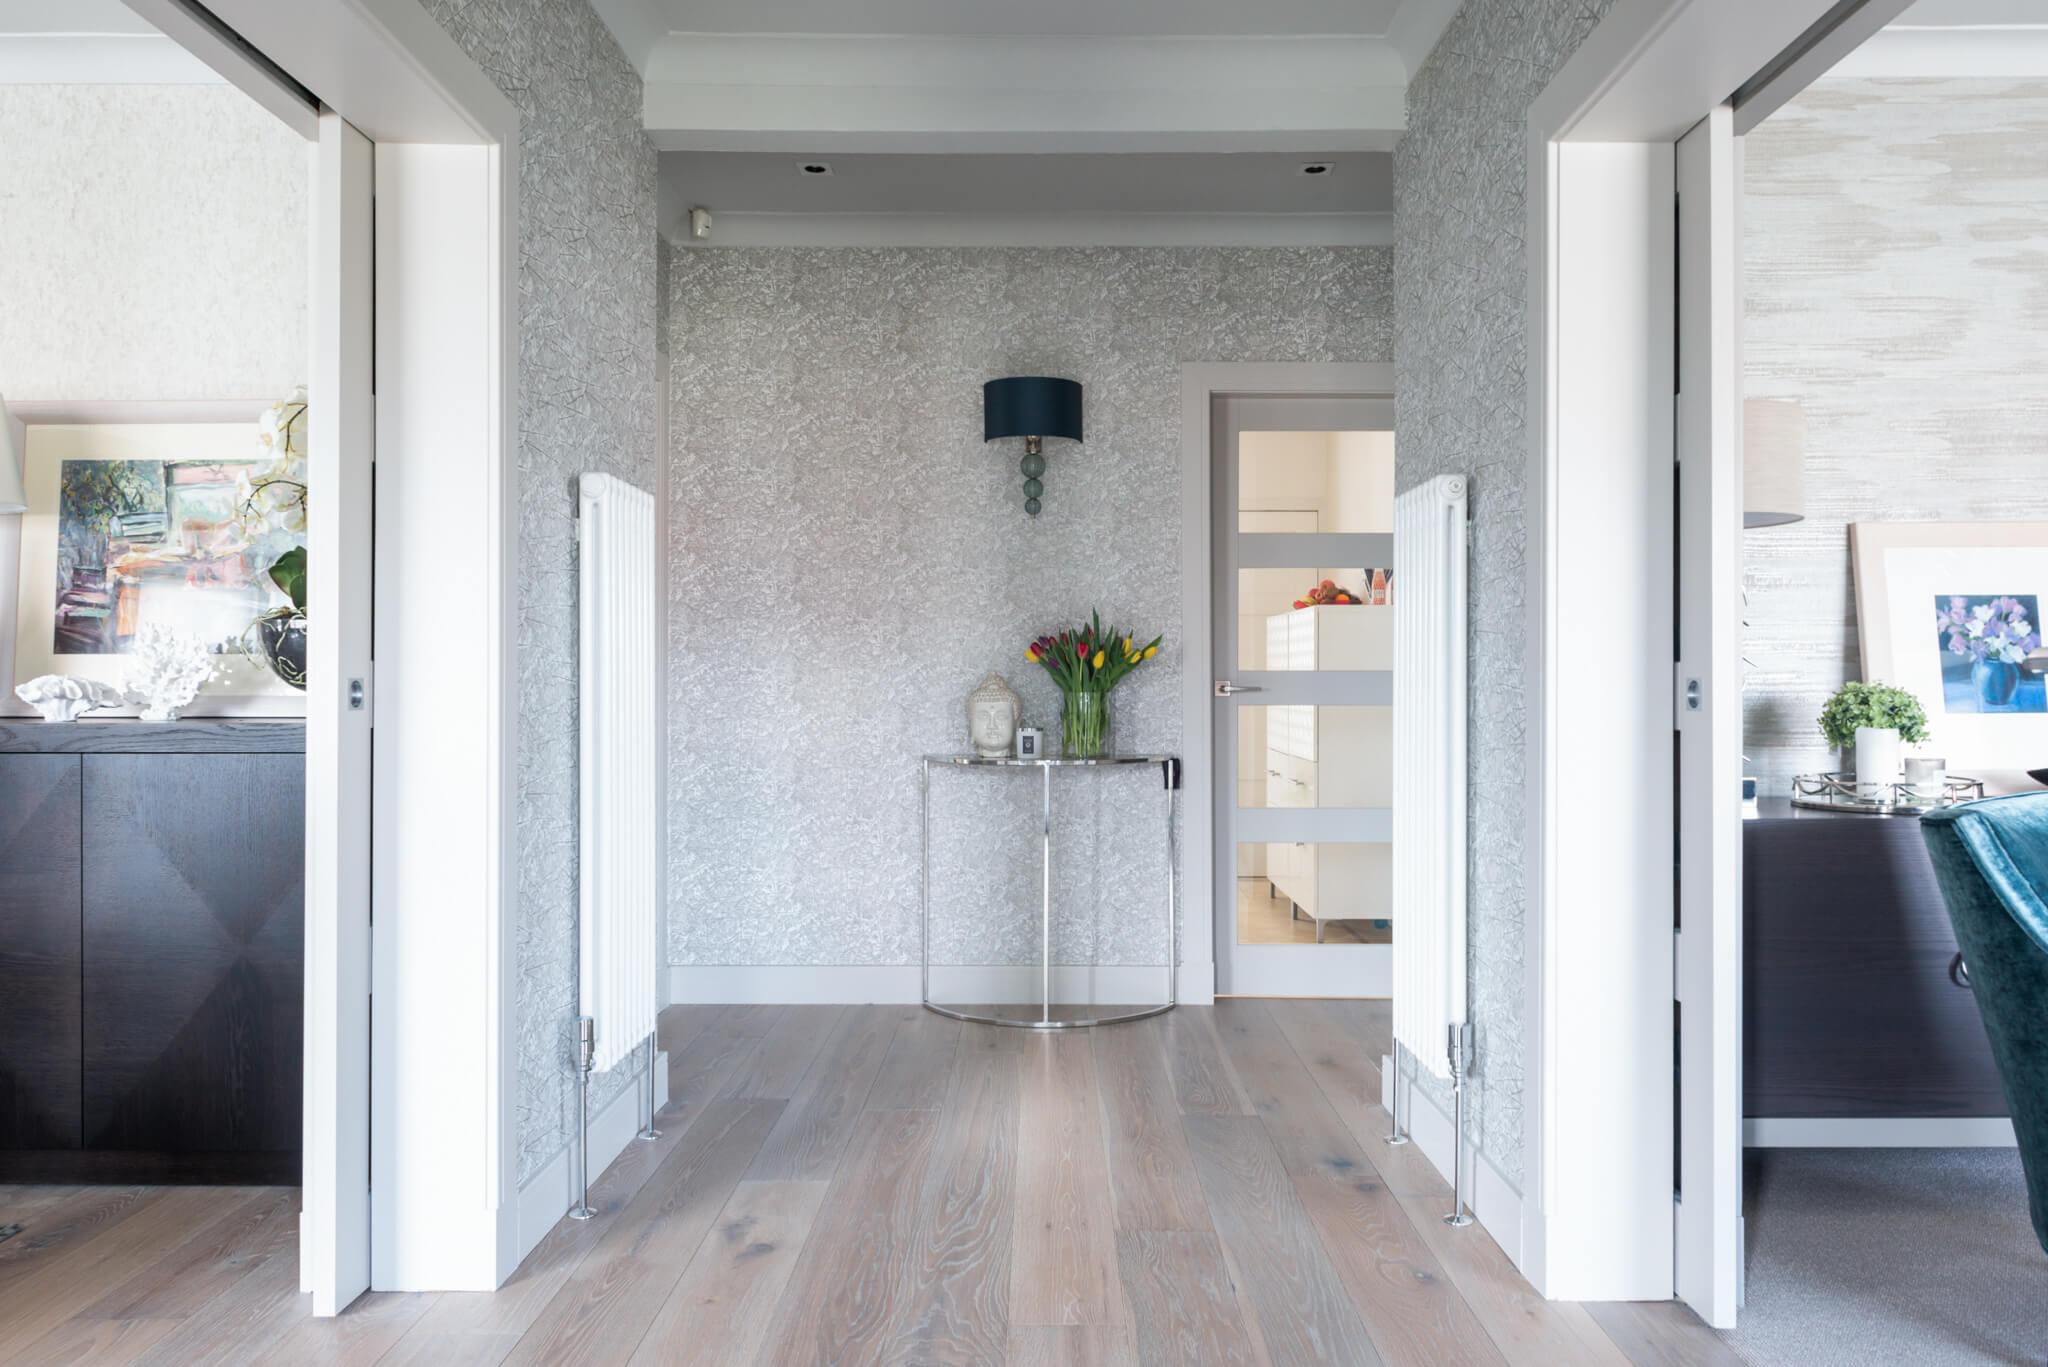 chelsea_mclaine-interior_hamilton-ryanjohnstonco-6